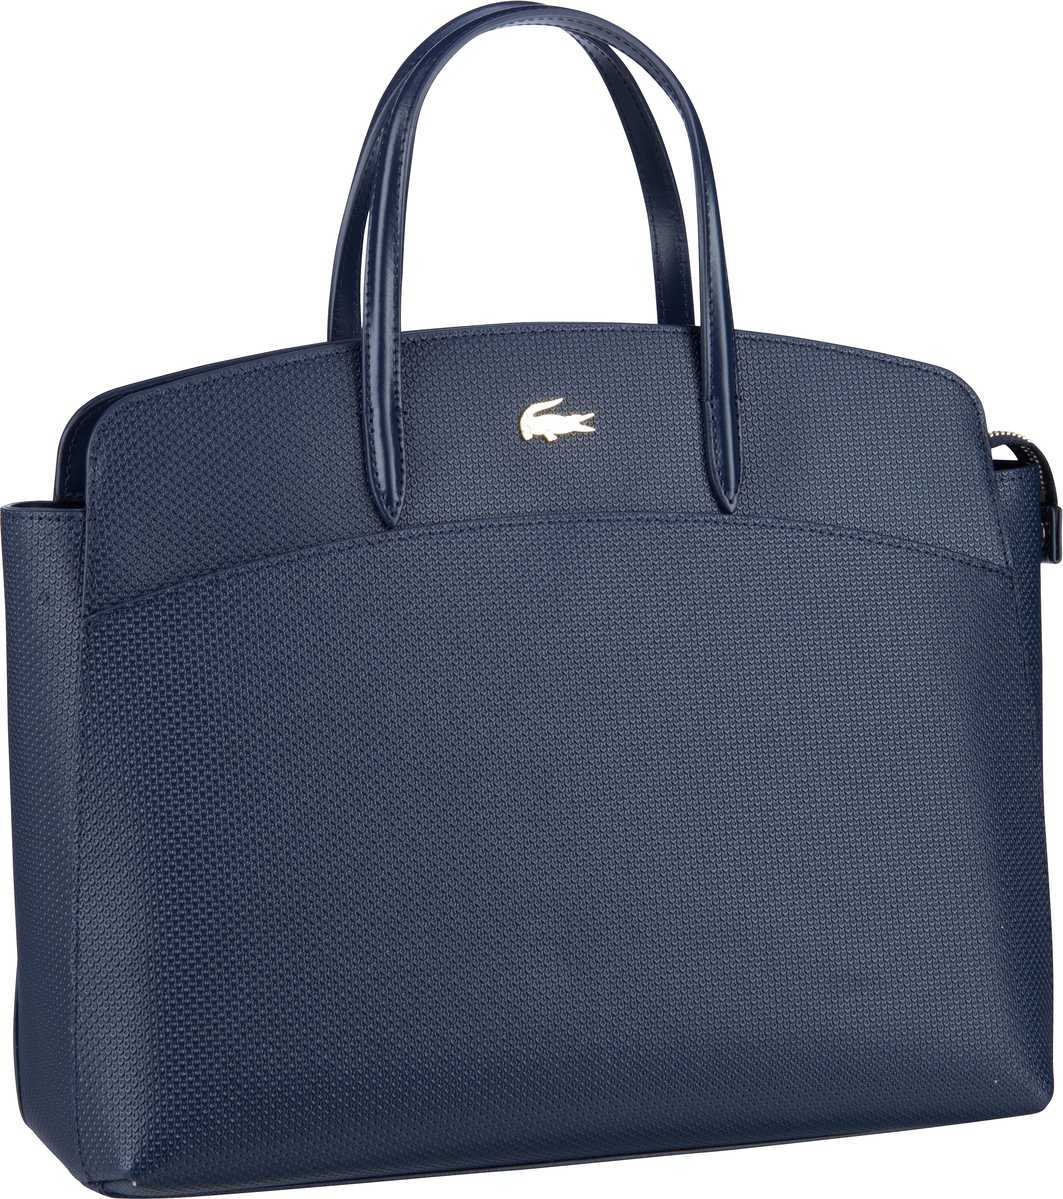 Handtasche Pockets Shopping Bag 2736 Peacoat